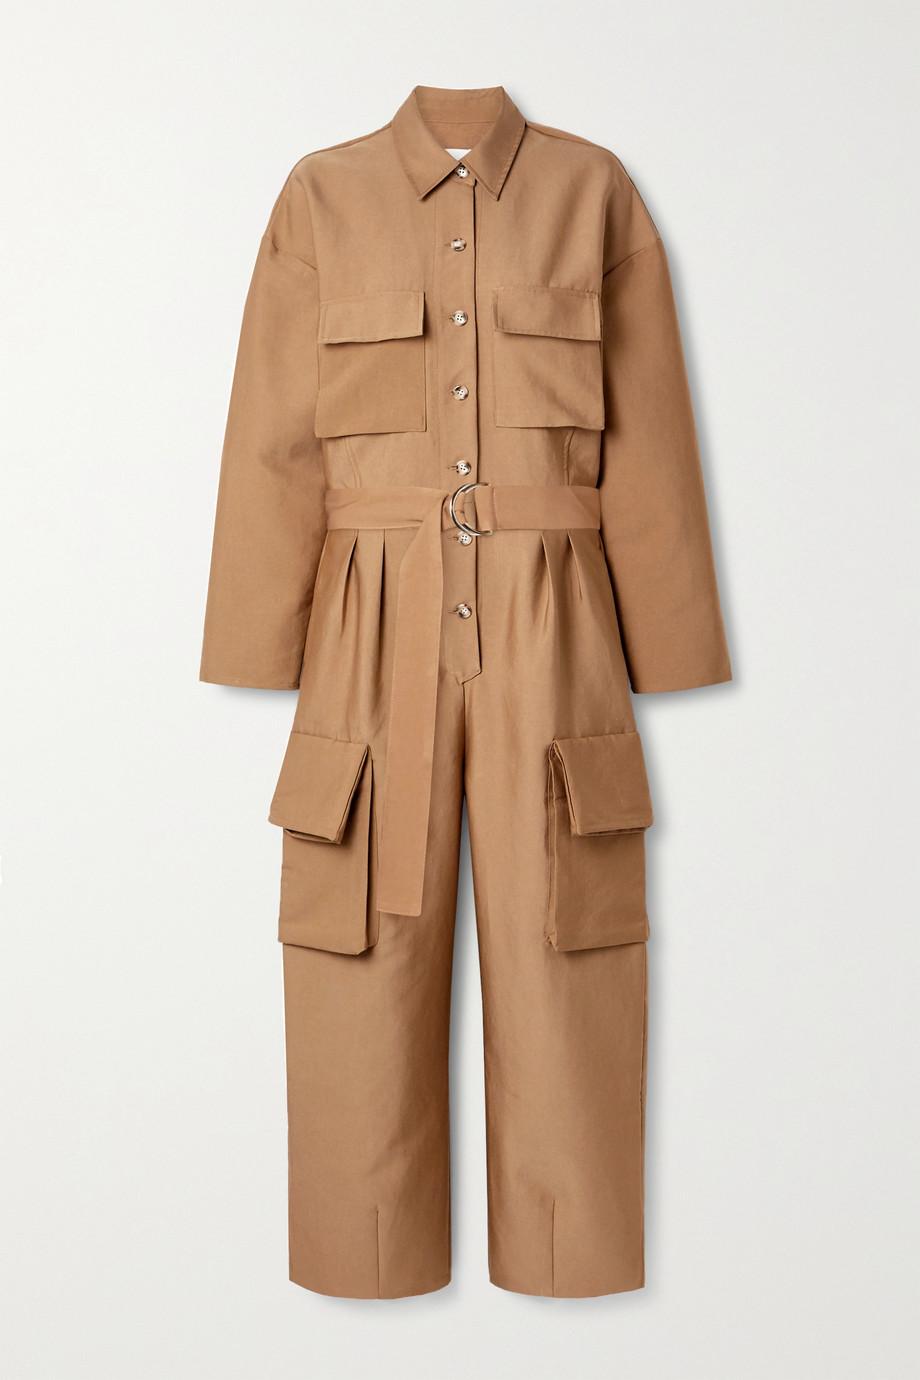 Frankie Shop Linda 斜纹布连身裤